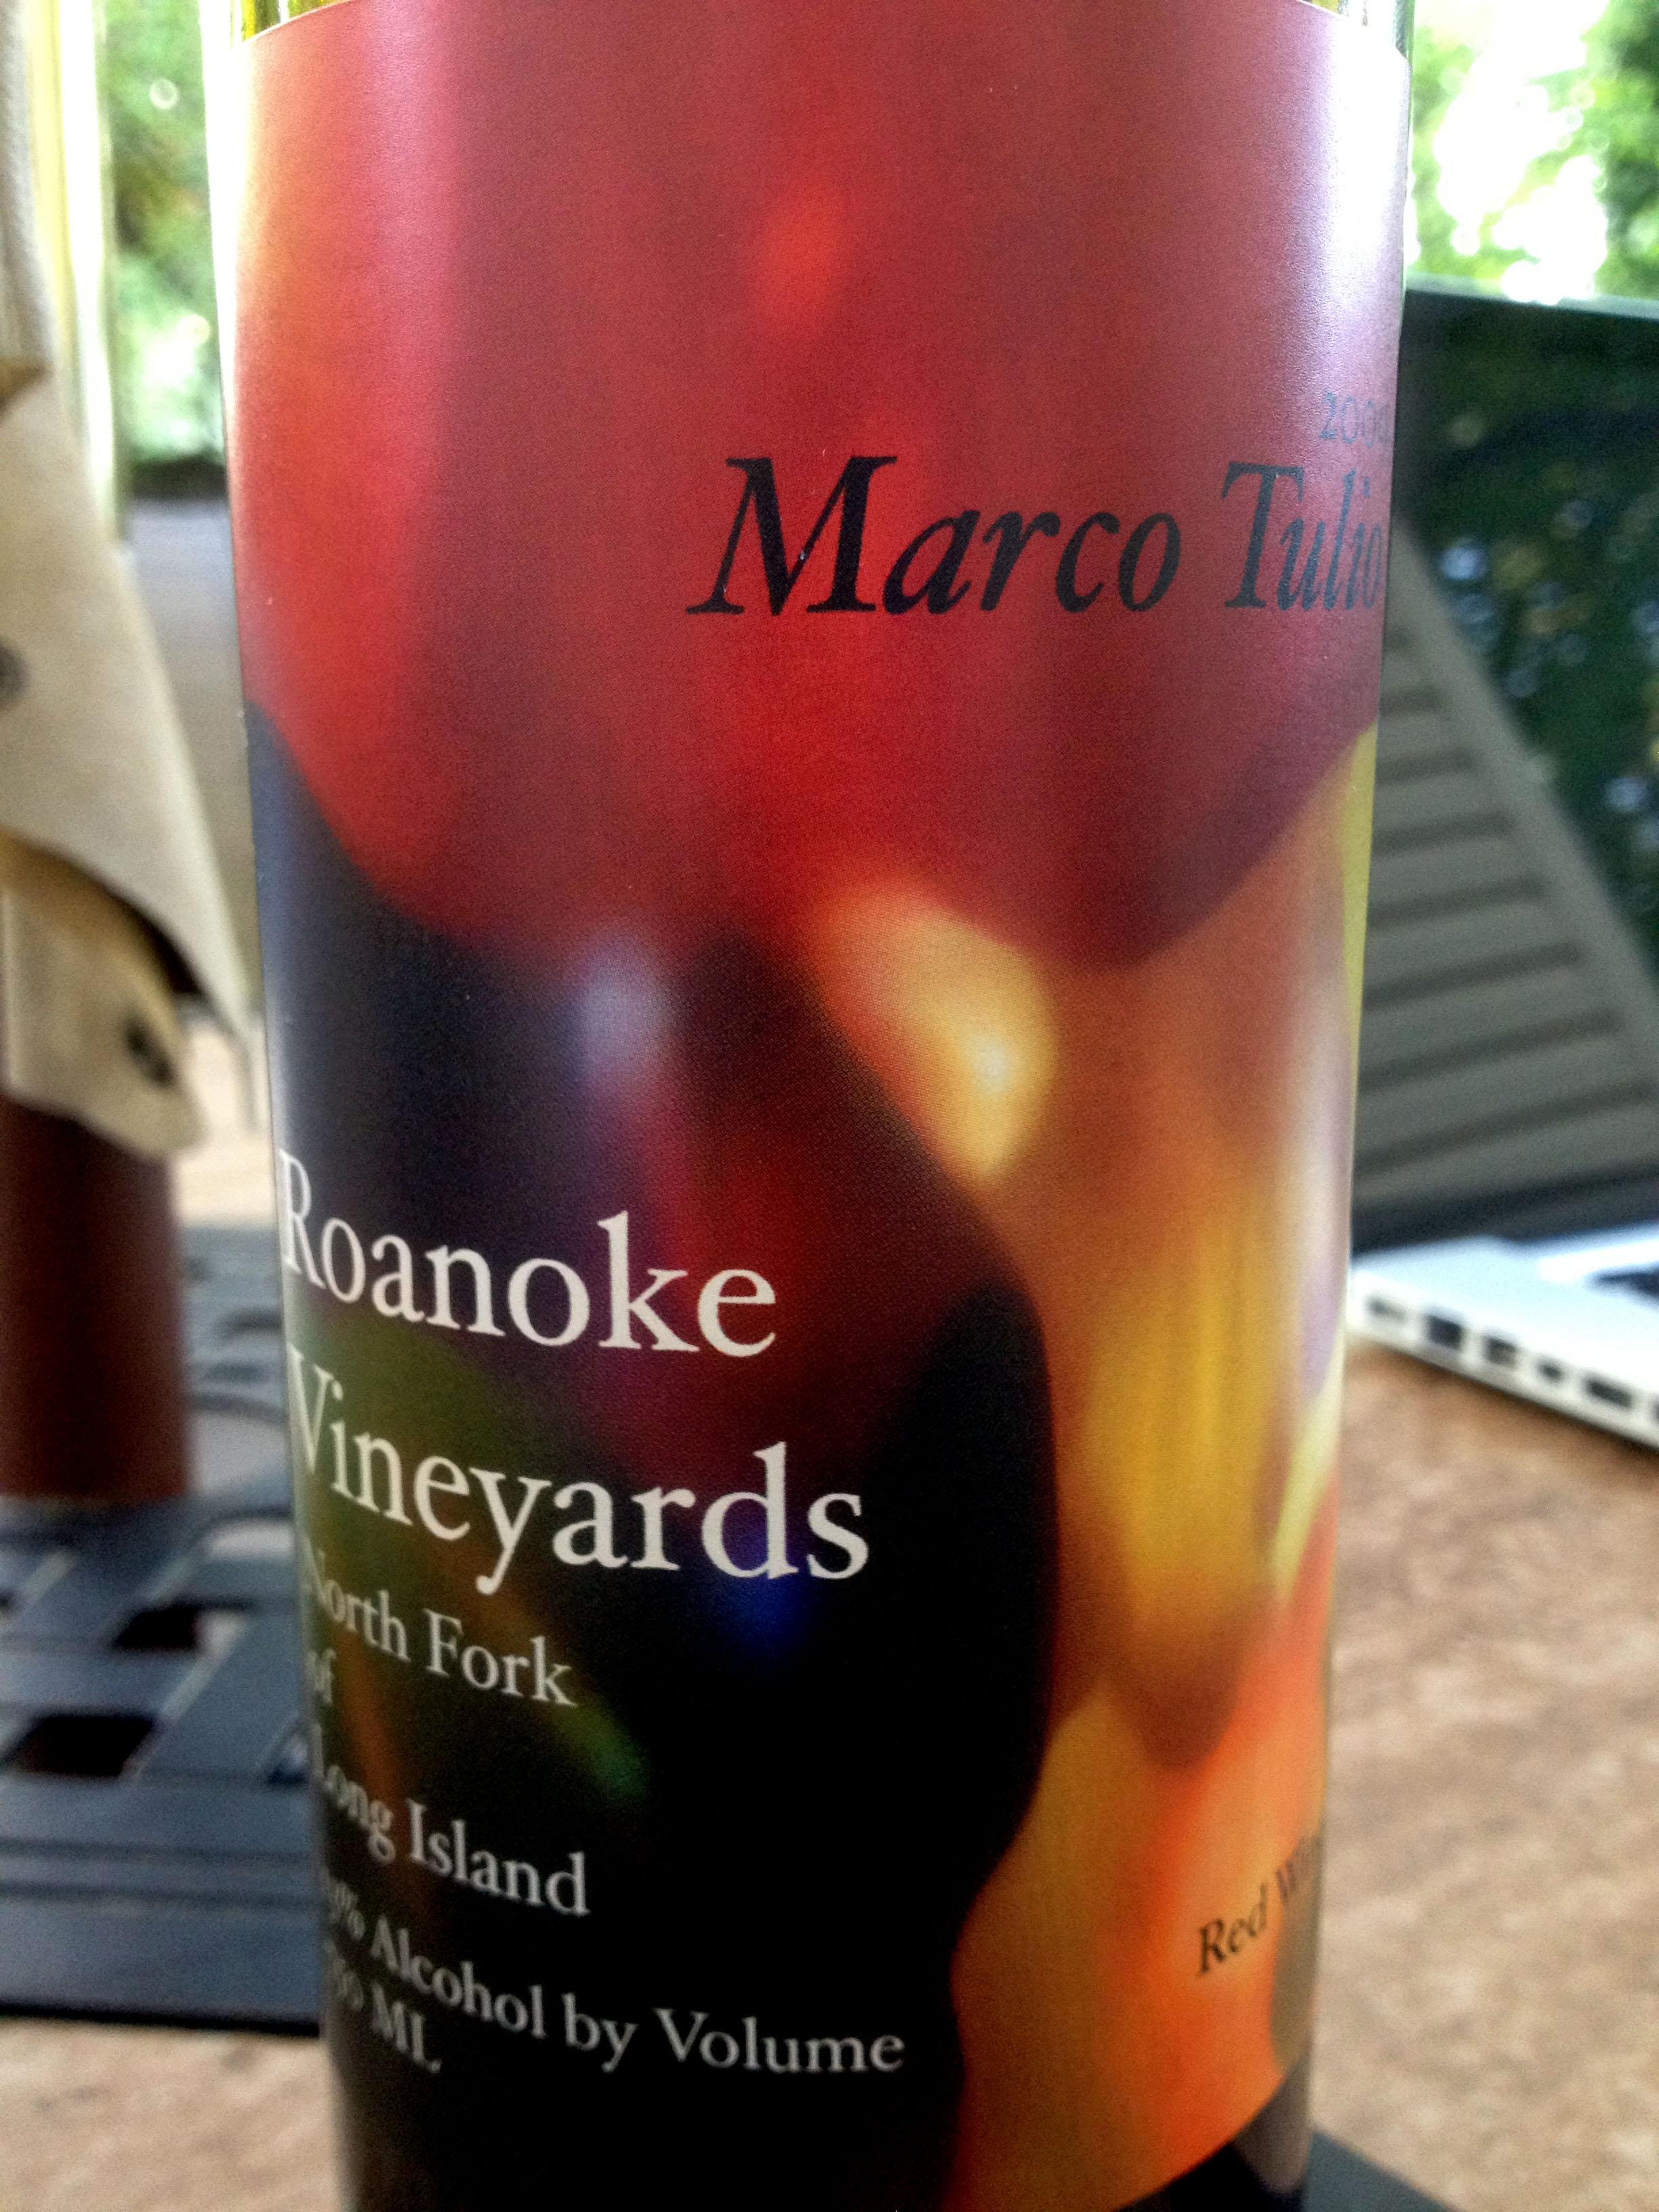 roanoke-09-marco-tulio